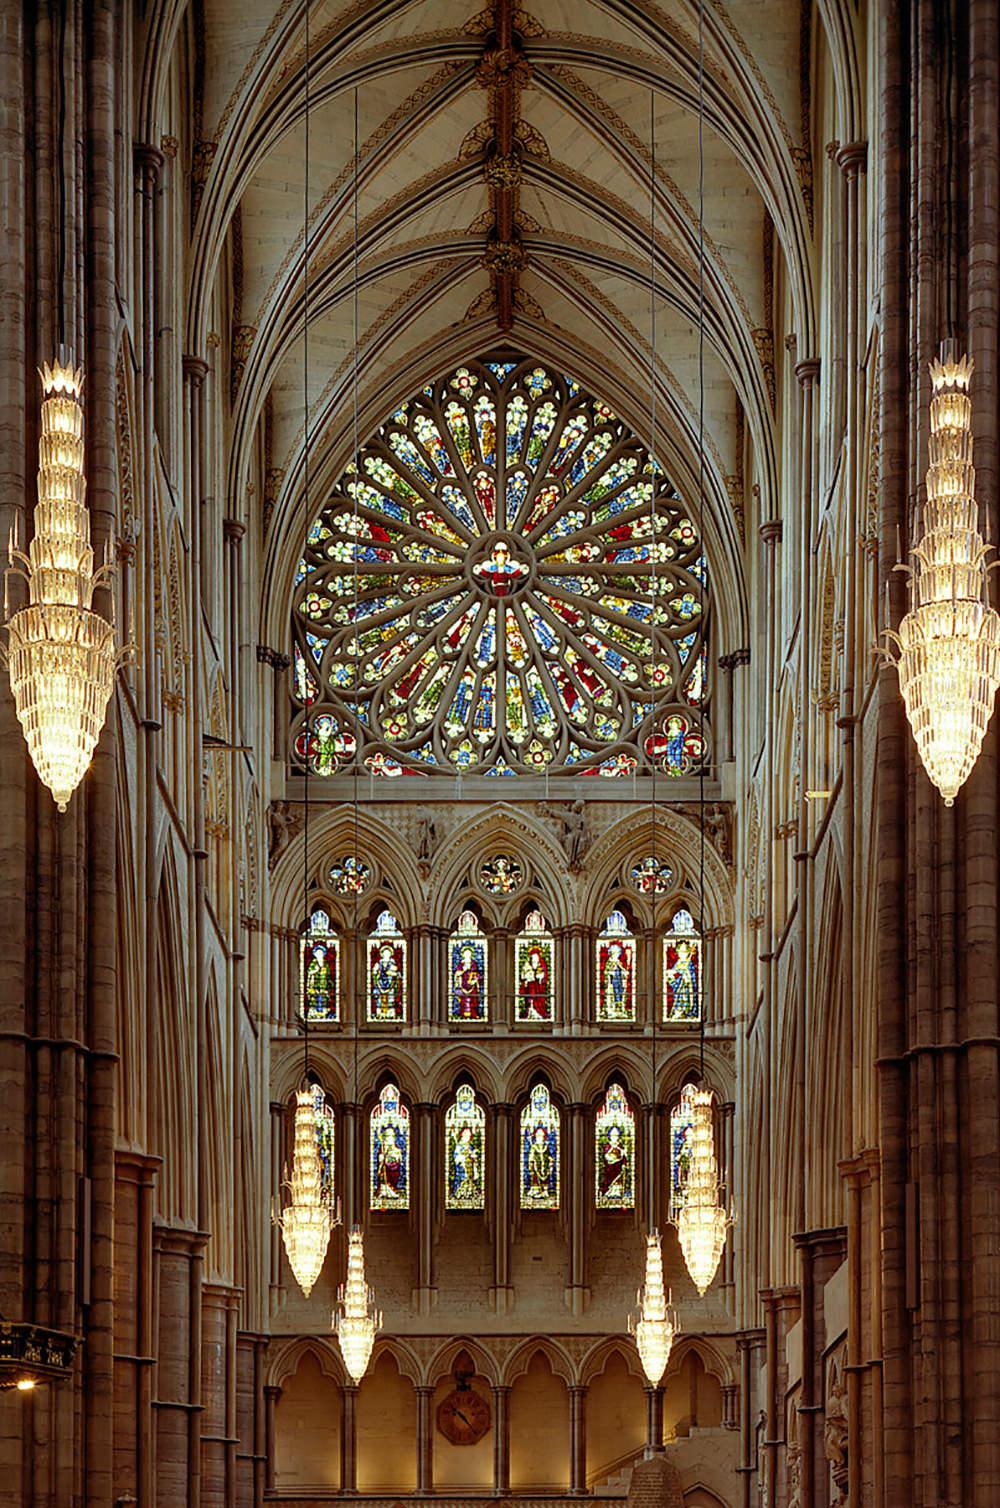 south-transept-rose-window